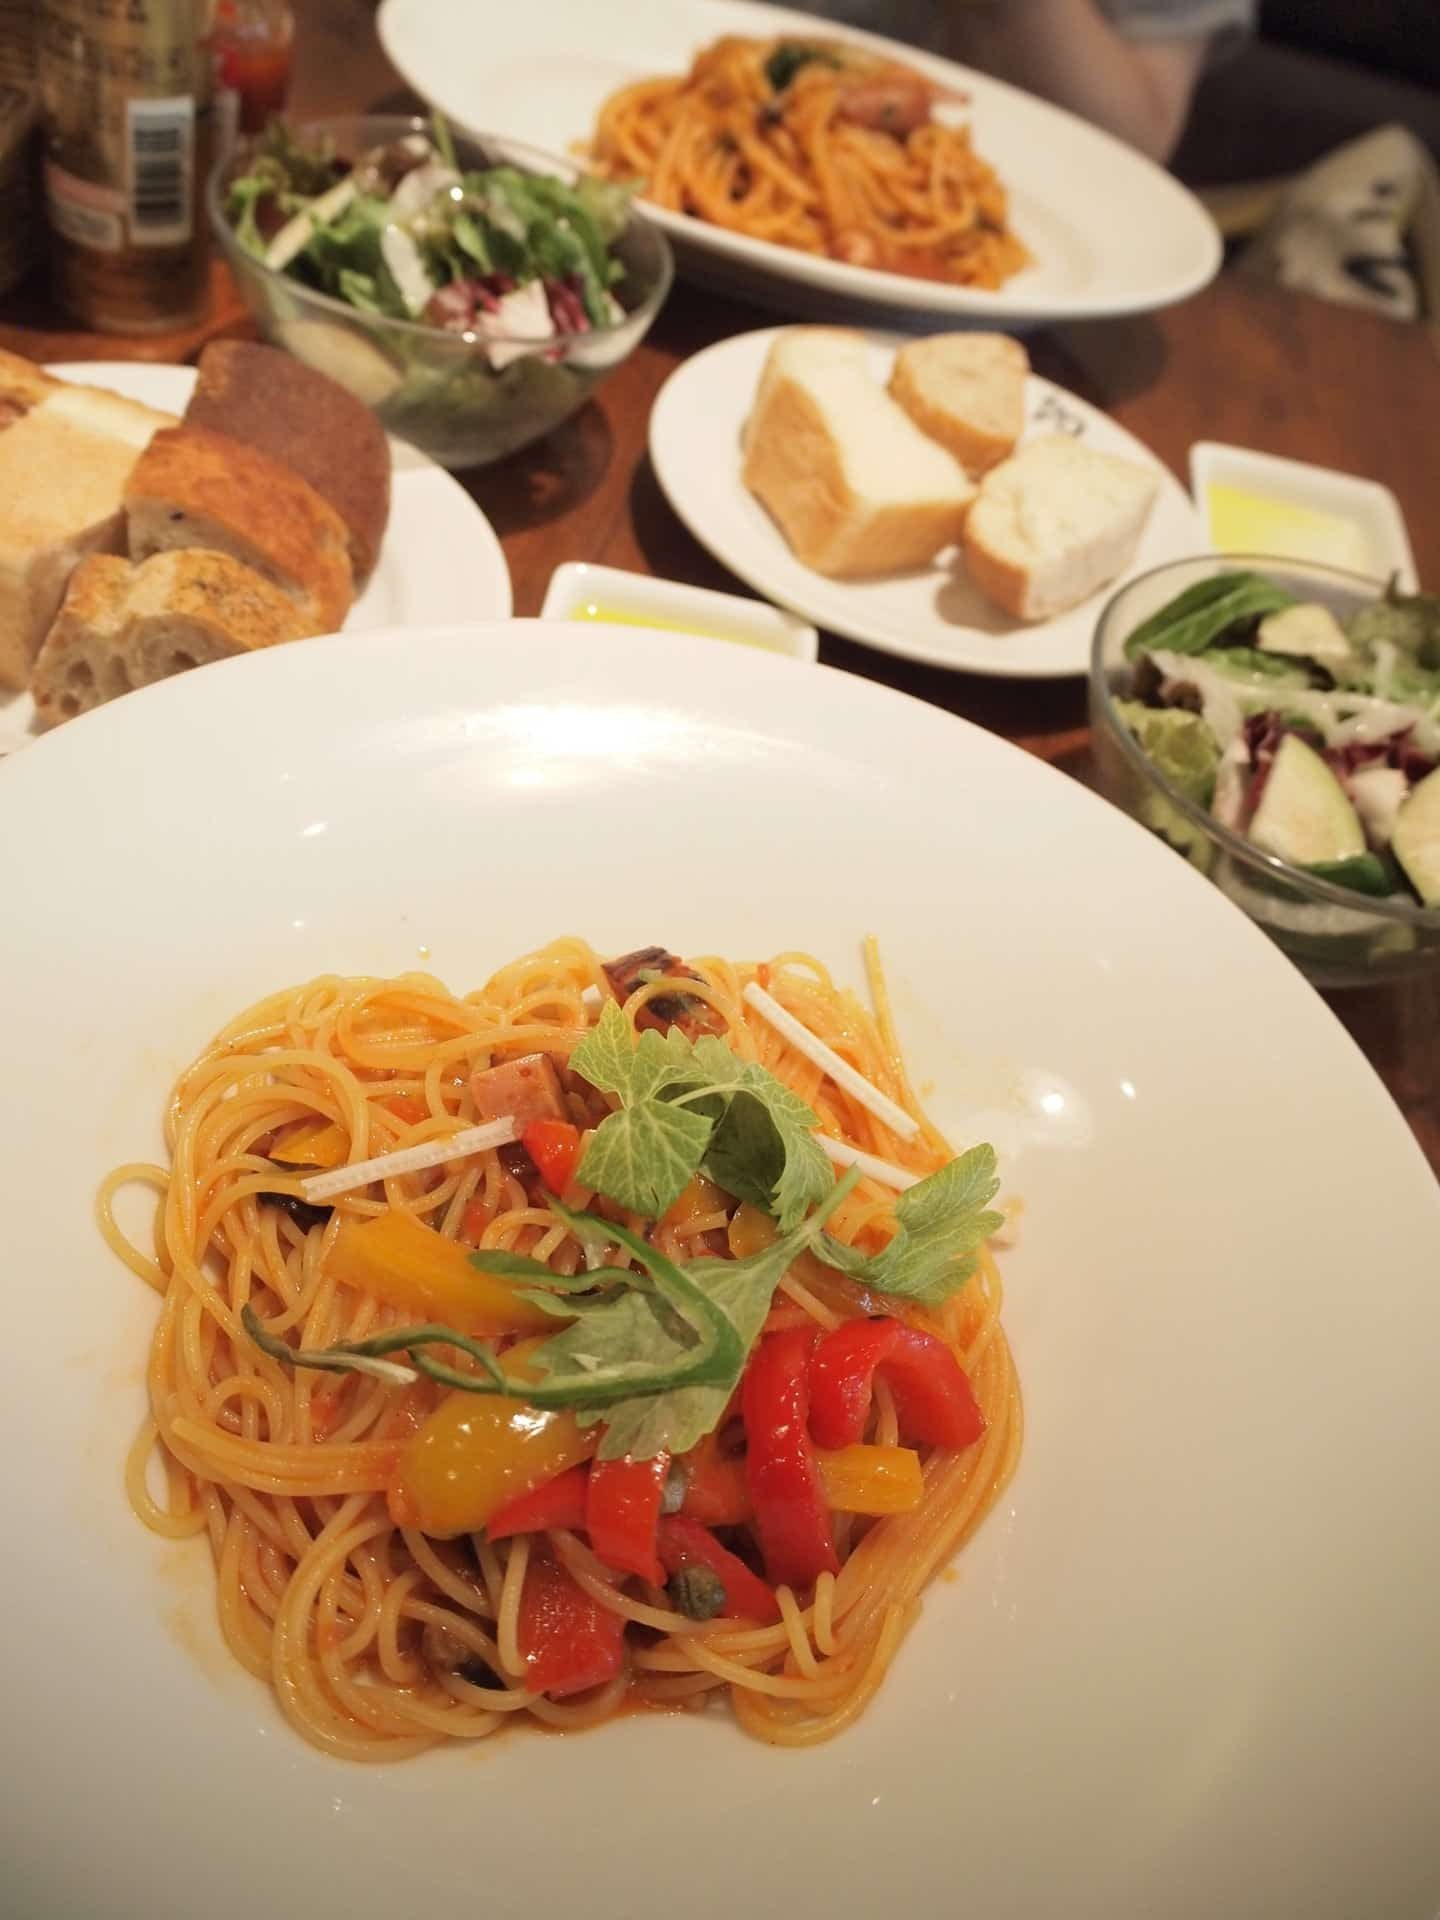 Bar&Bistro 64 − 神戸・旧居留地でランチ。パン食べ放題&サラダ食べ放題&ドリンクバー!名物はナポリタン